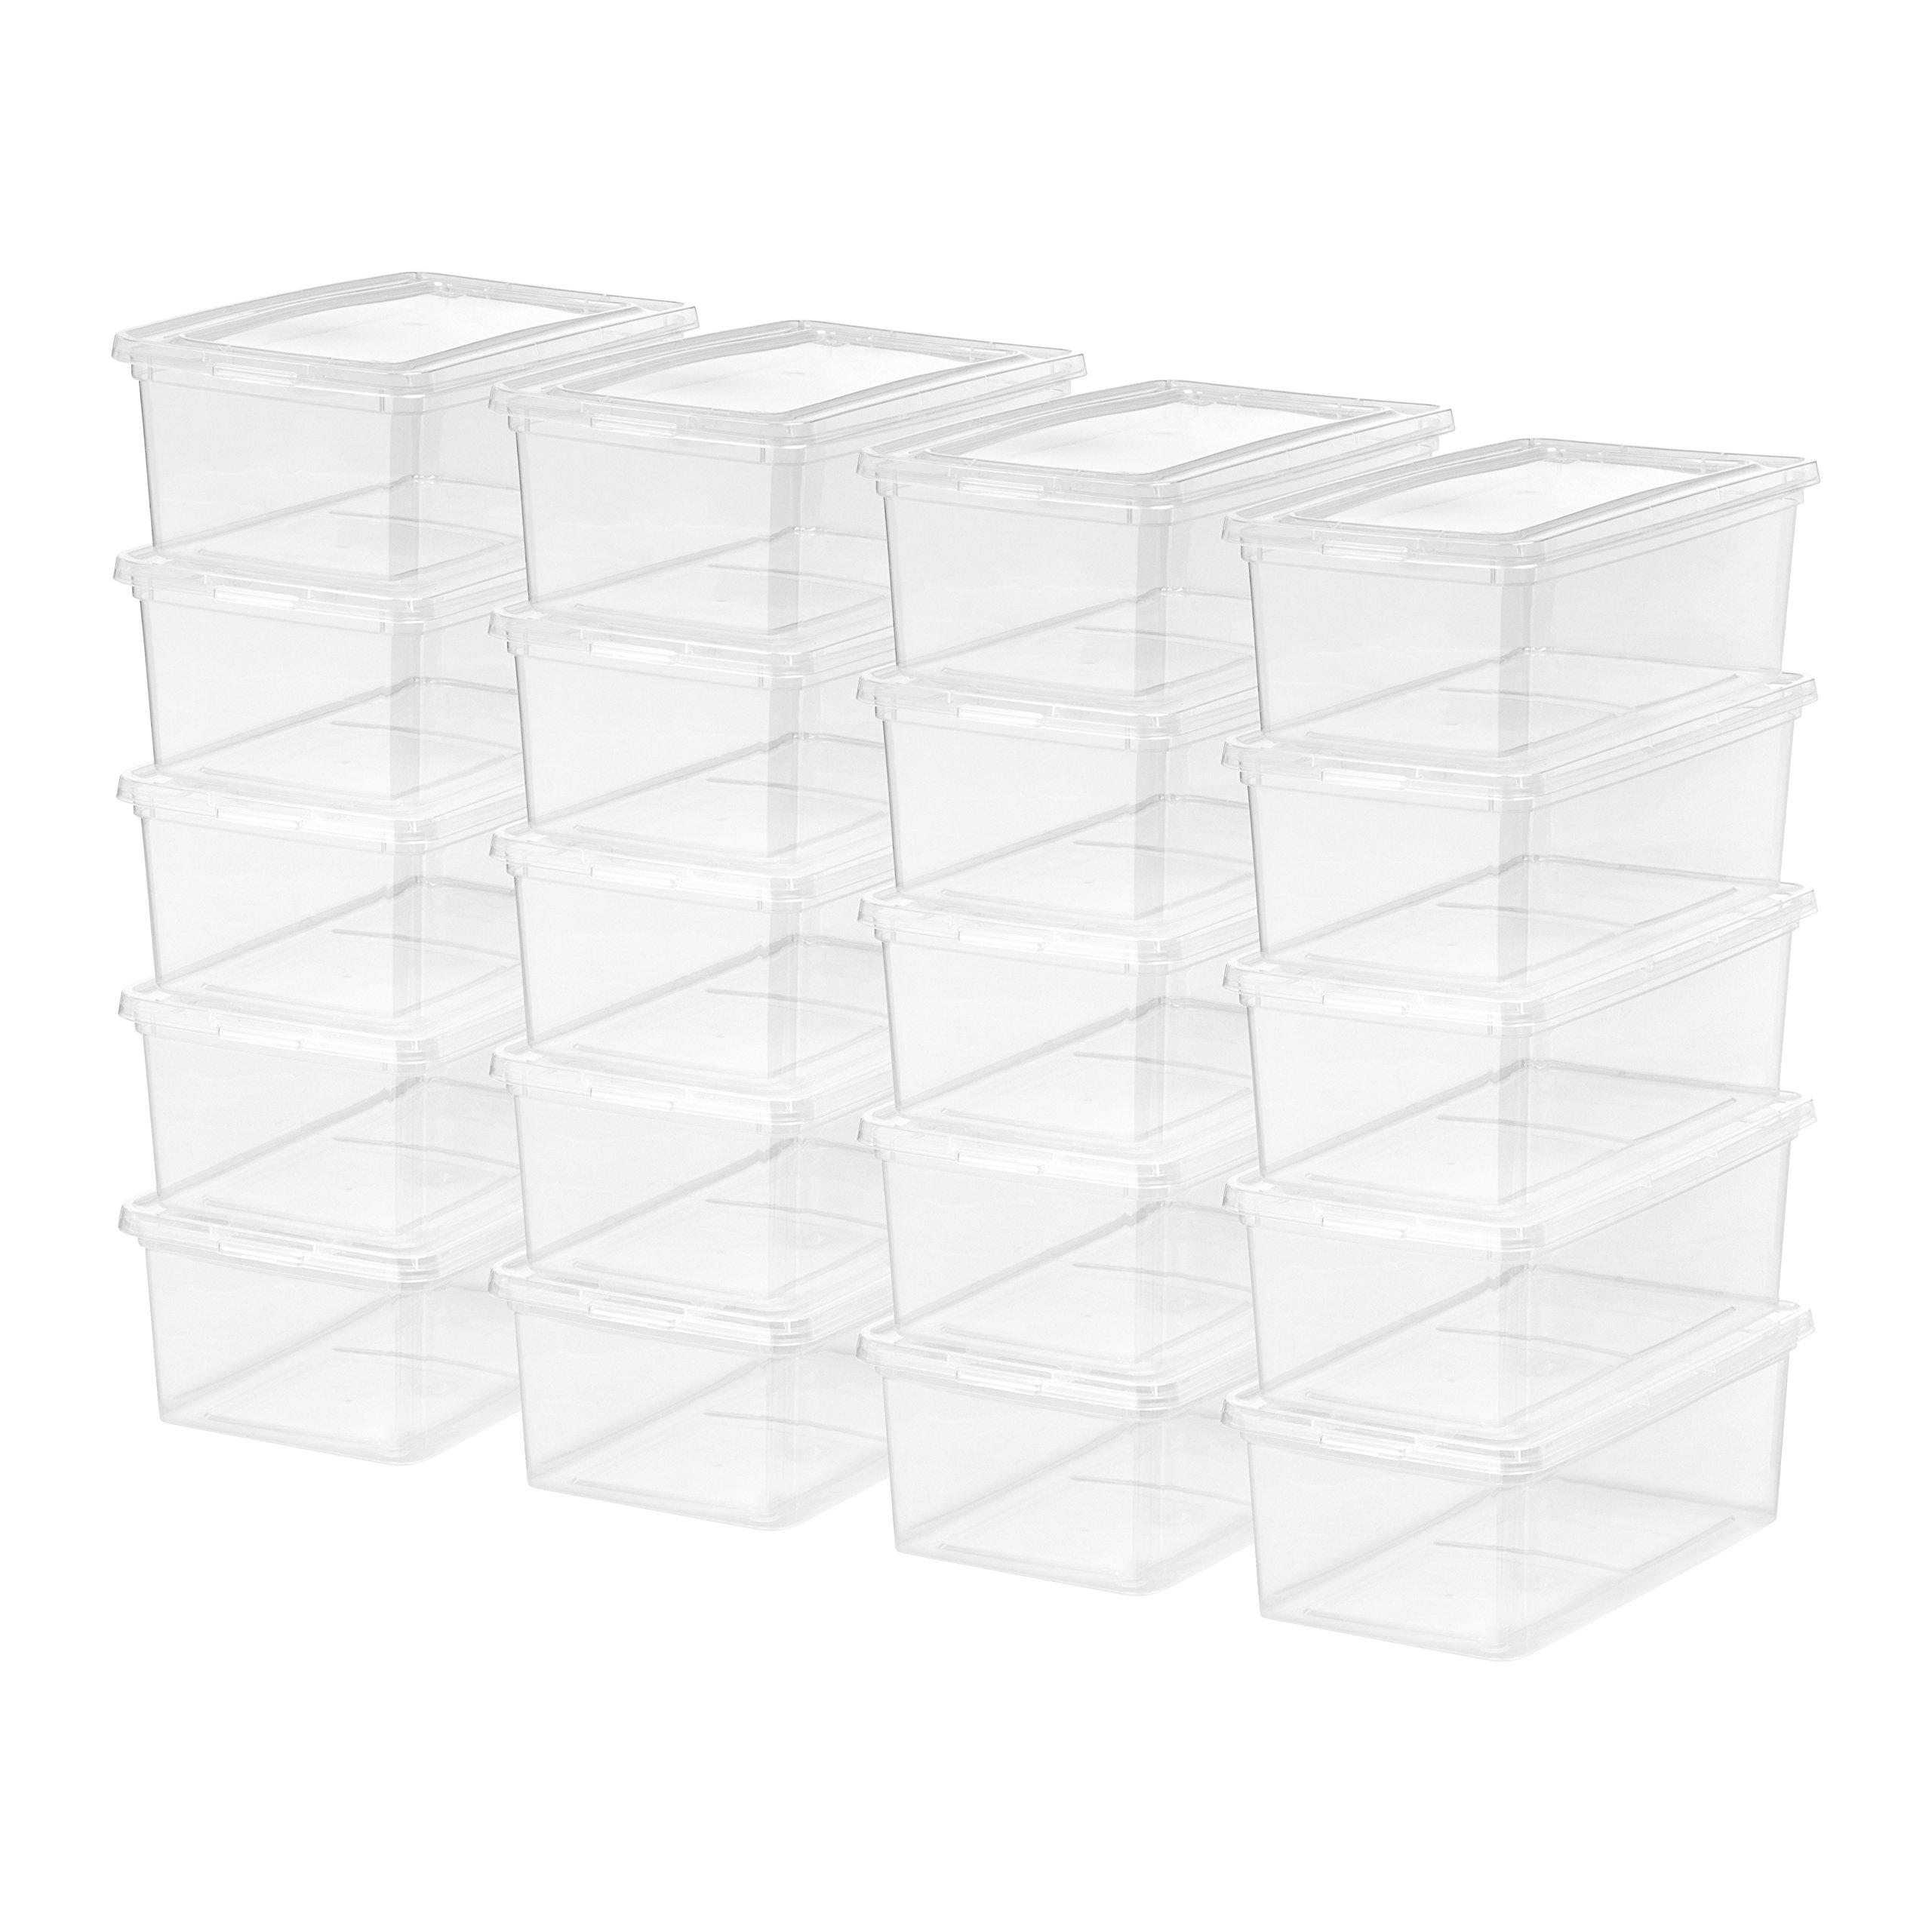 IRIS USA, Inc. CNL-5 Storage Box, 5 Quart, Clear, 20 Pack by IRIS USA, Inc.